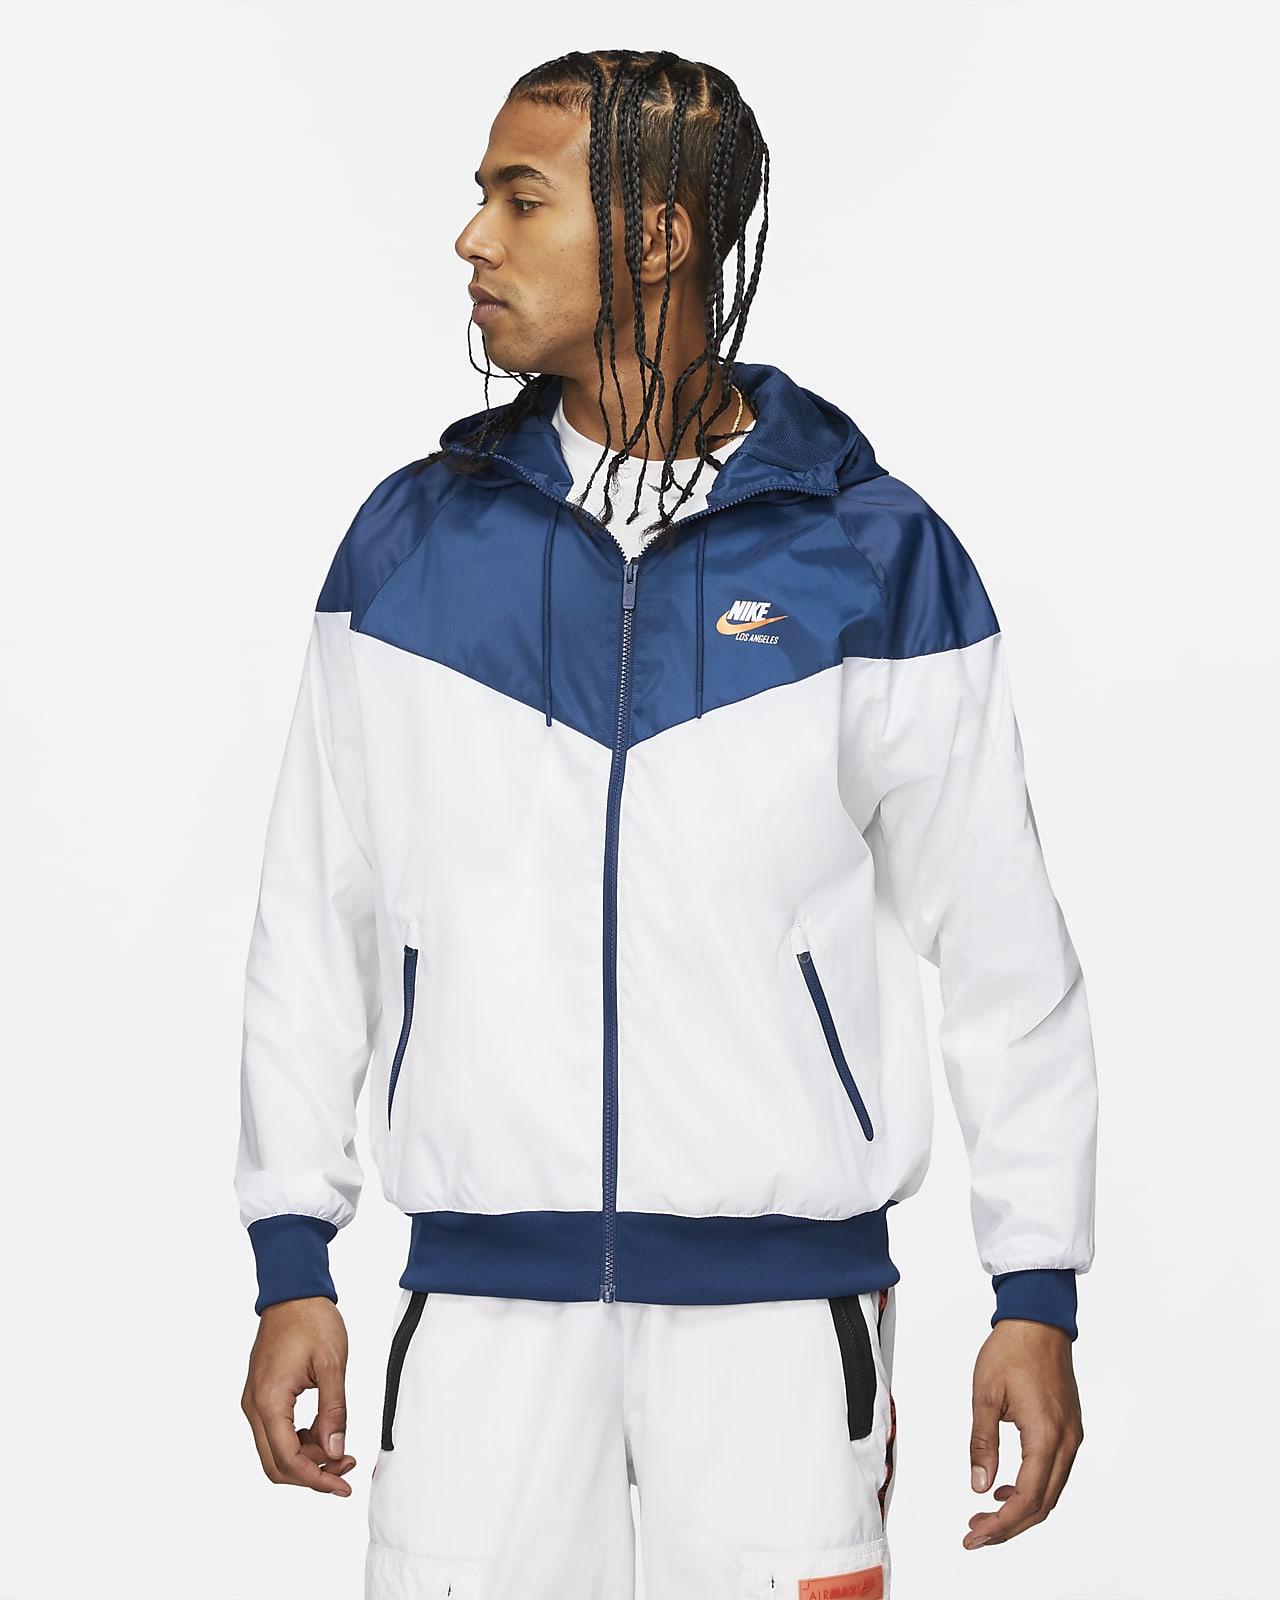 Nike Sportswear Heritage Essentials Windrunner Men's Hooded Woven Jacket